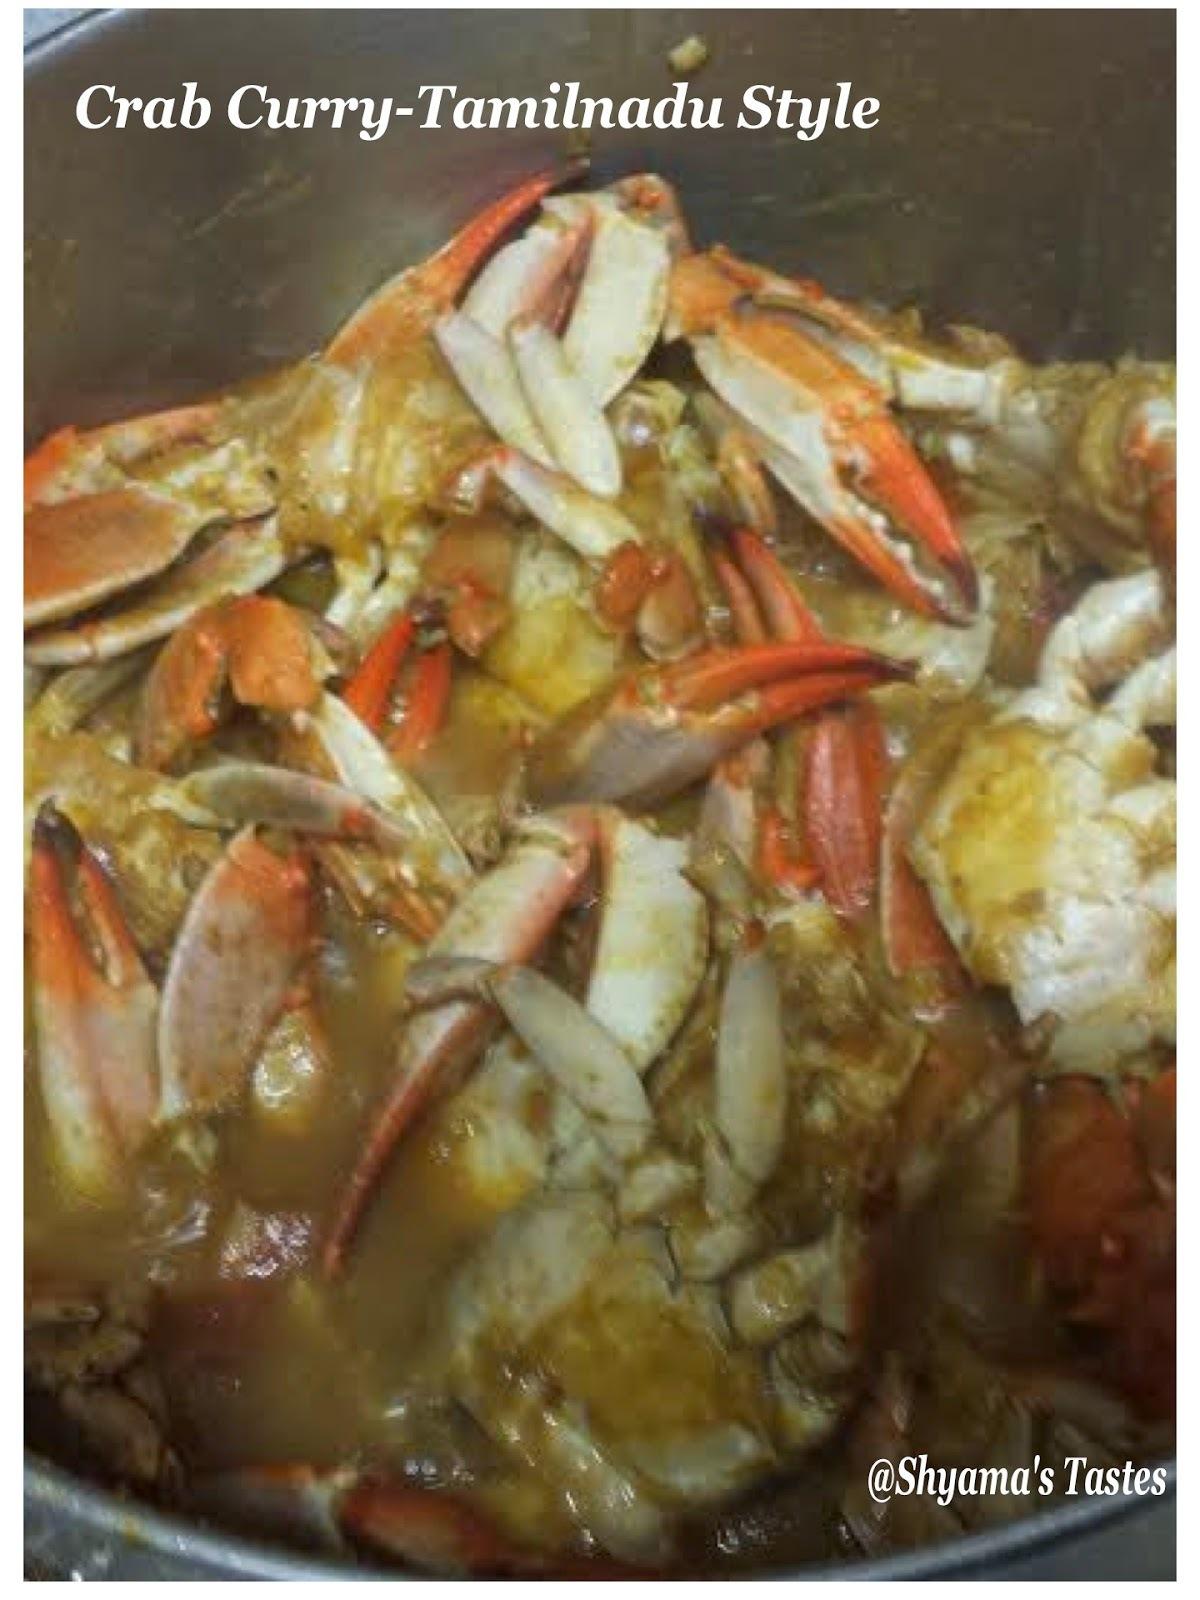 Crab Masala-Tamilnadu Style